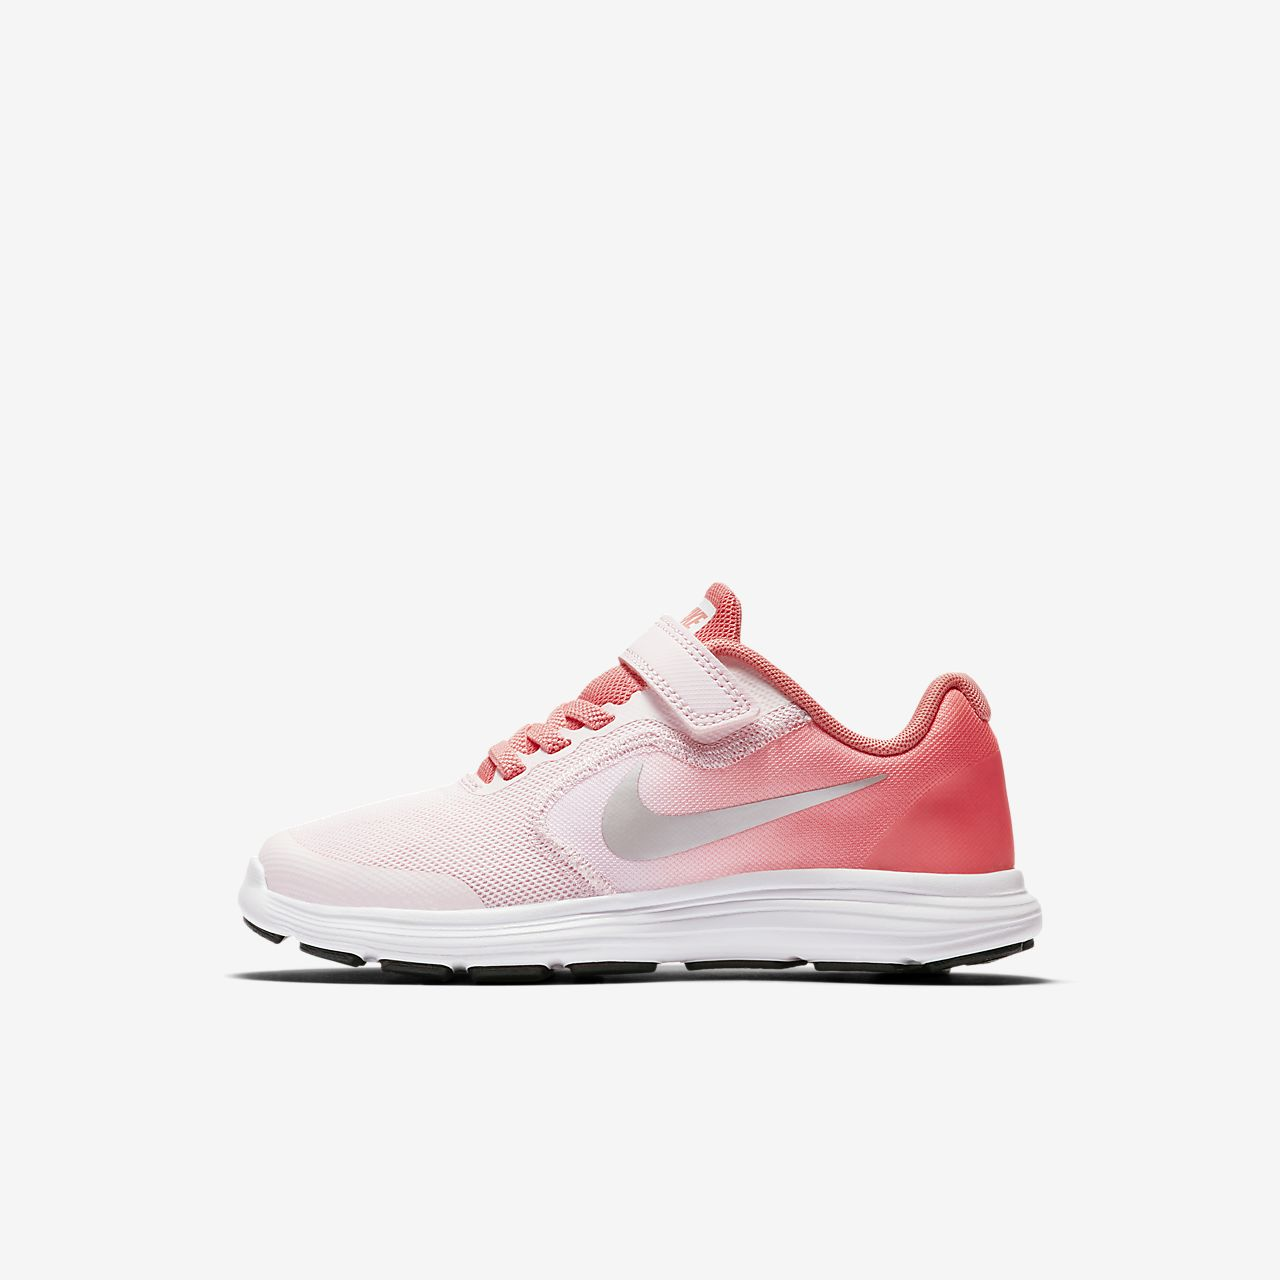 bffe2fc784927 Nike Revolution 3 Younger Kids  Running Shoe. Nike.com GB